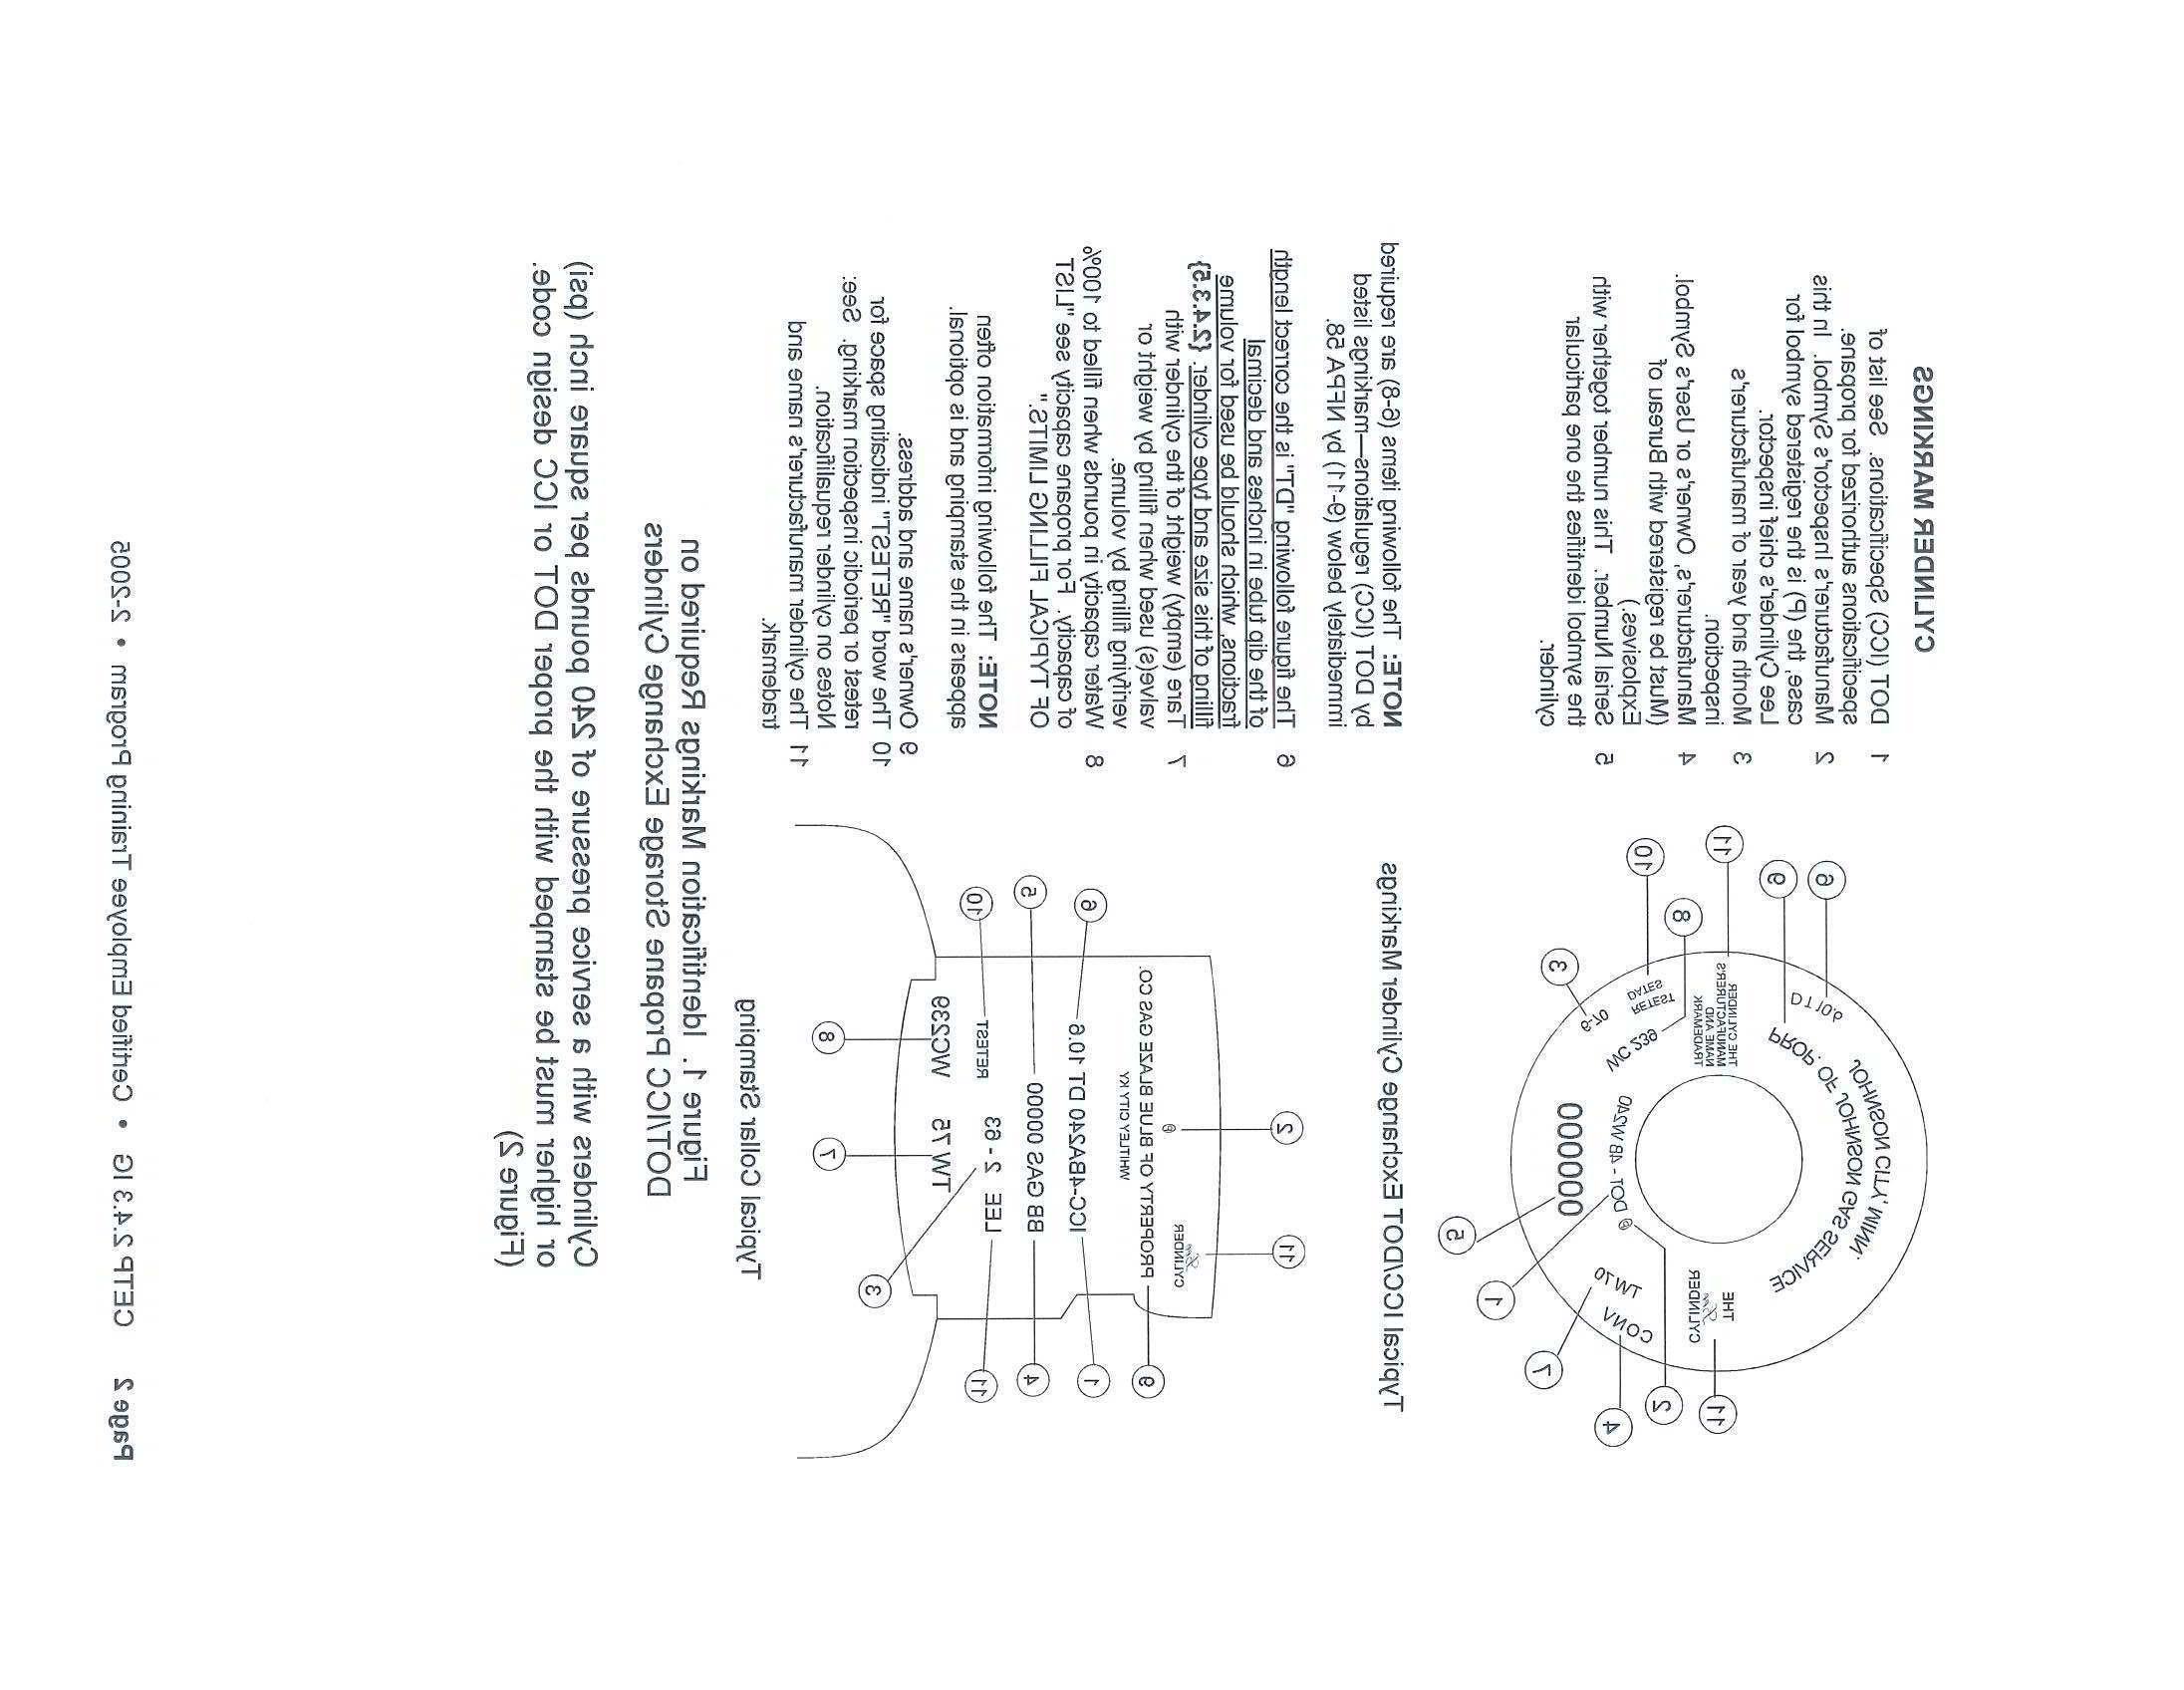 propane tank markings  u2013 security sistems